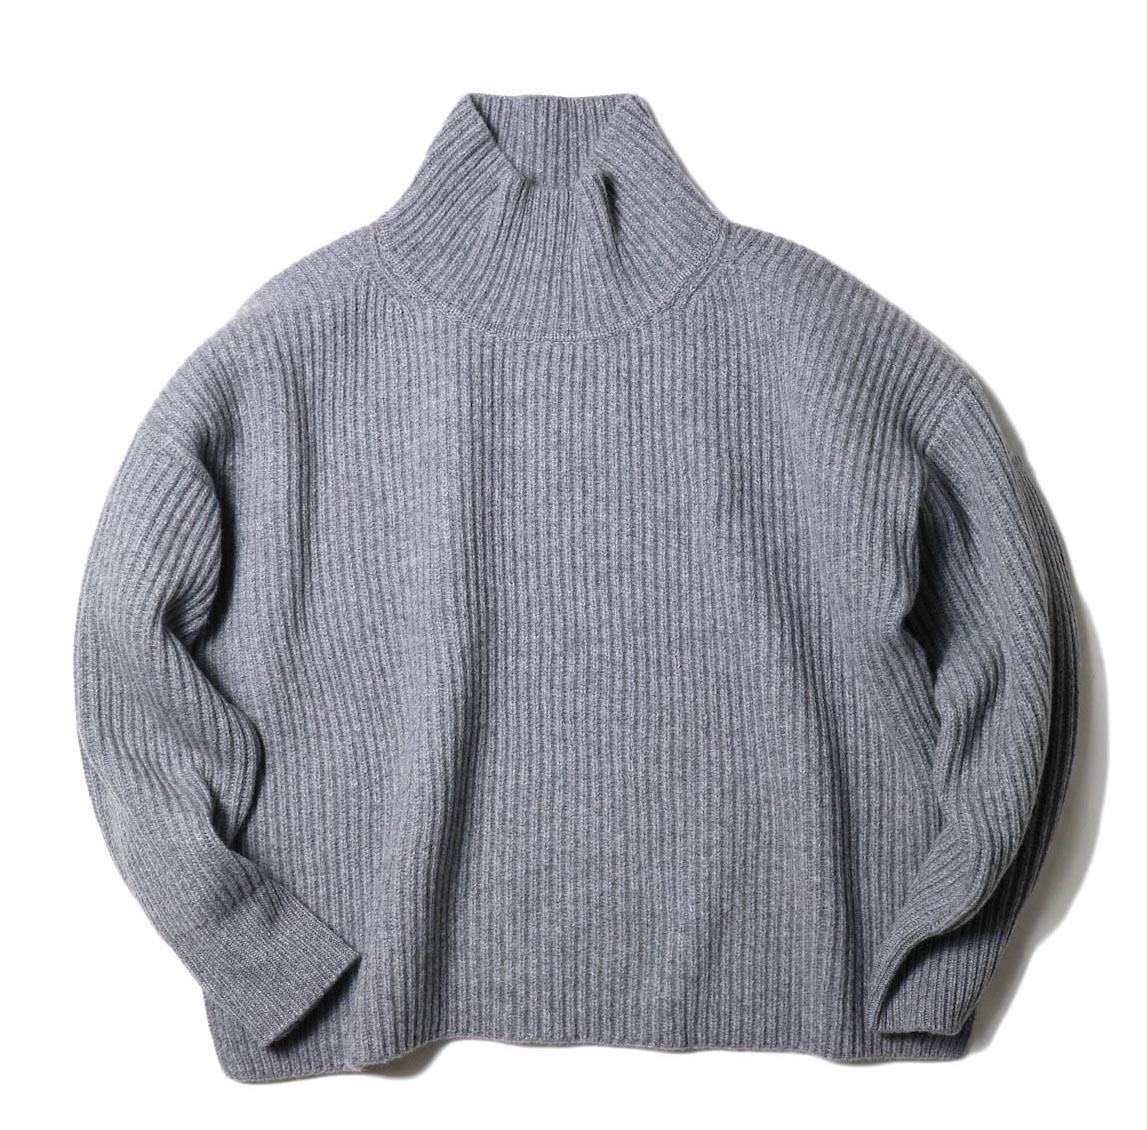 YLEVE / EXTRAFINE MERINO WOOL RIB KN TURTLE (grey)